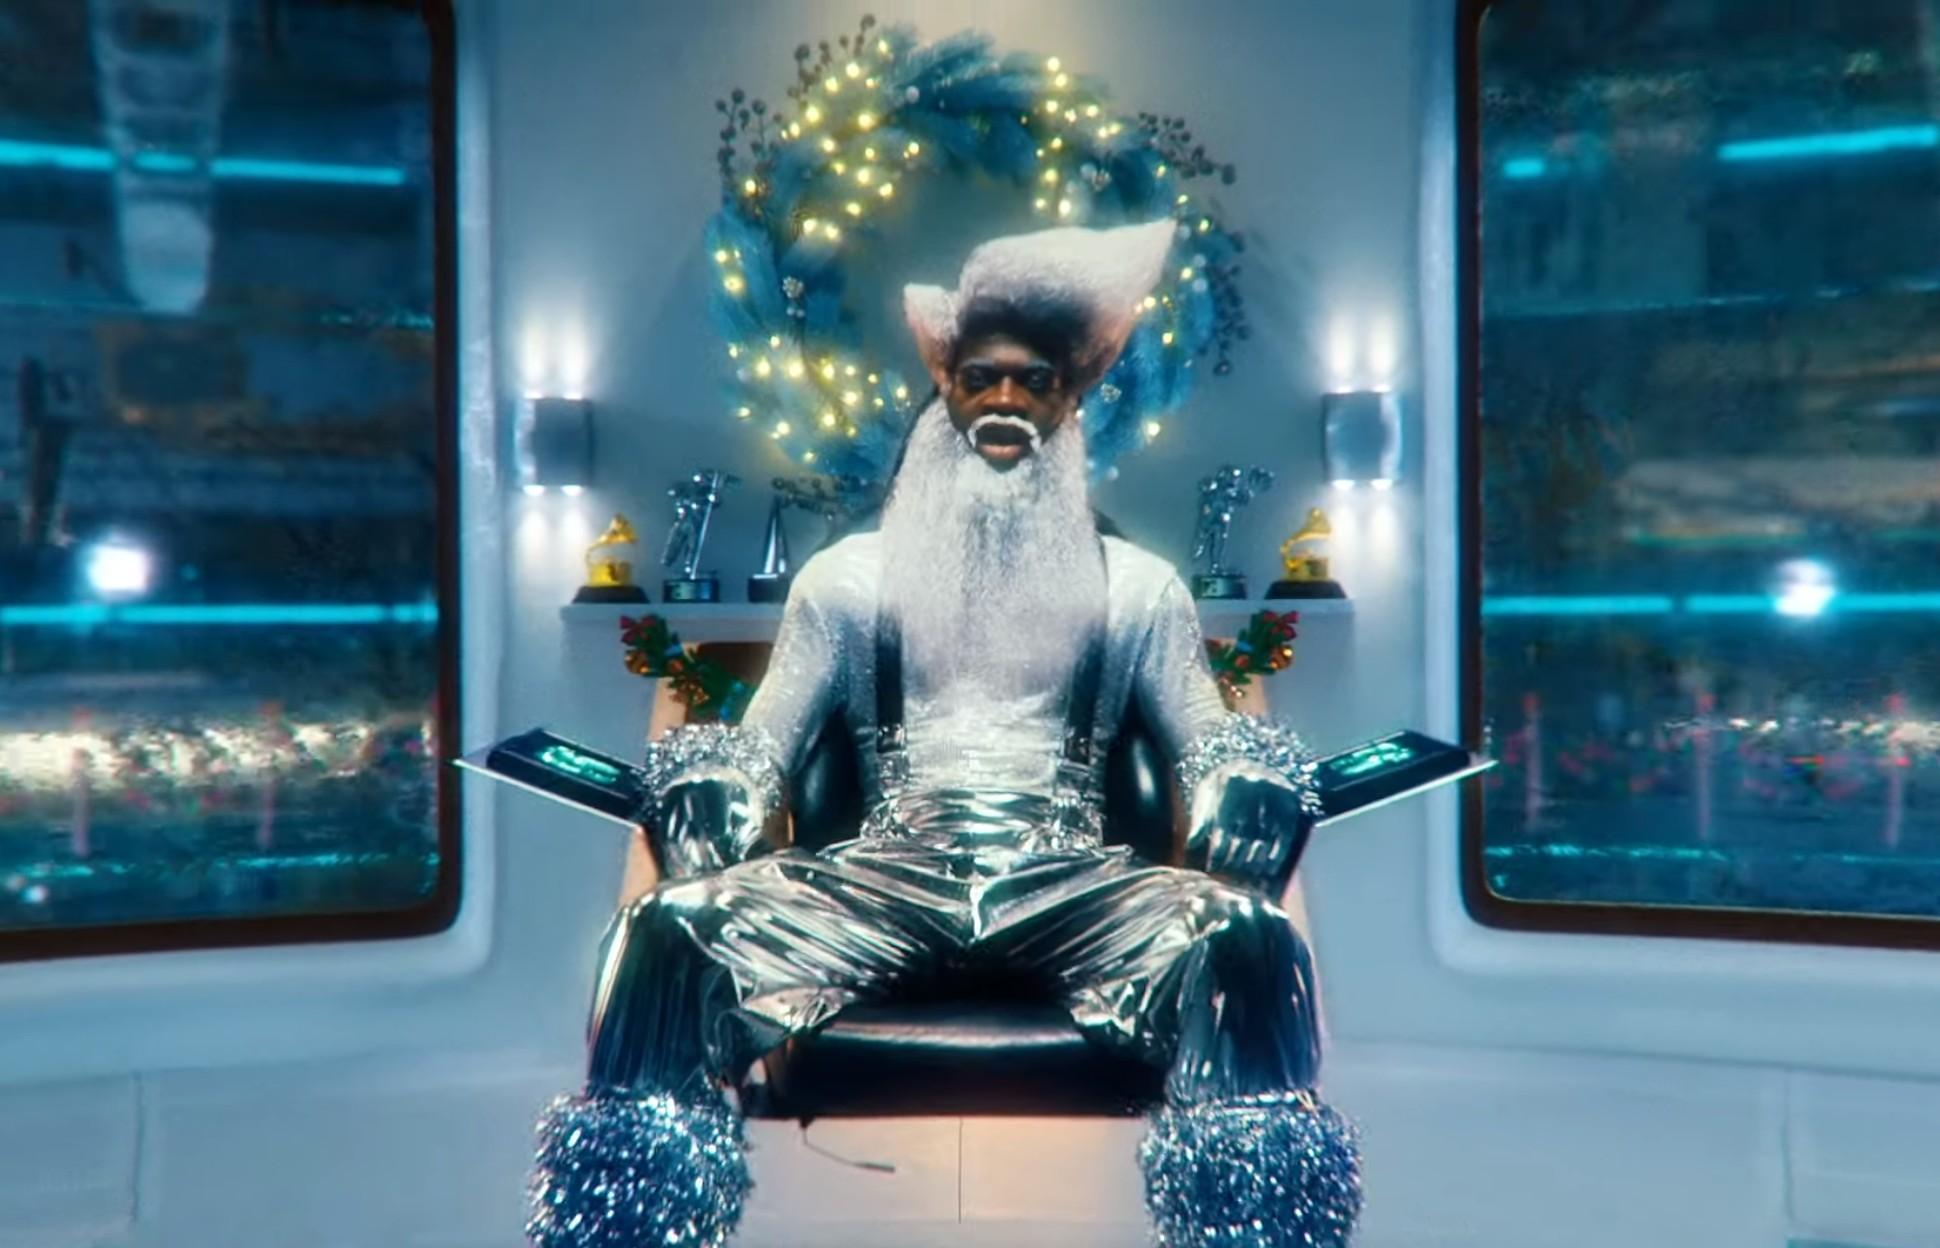 Lil Nas X Transforms Into Futuristic Santa Claus In New 'Holiday' Music Video | ETCanada.com